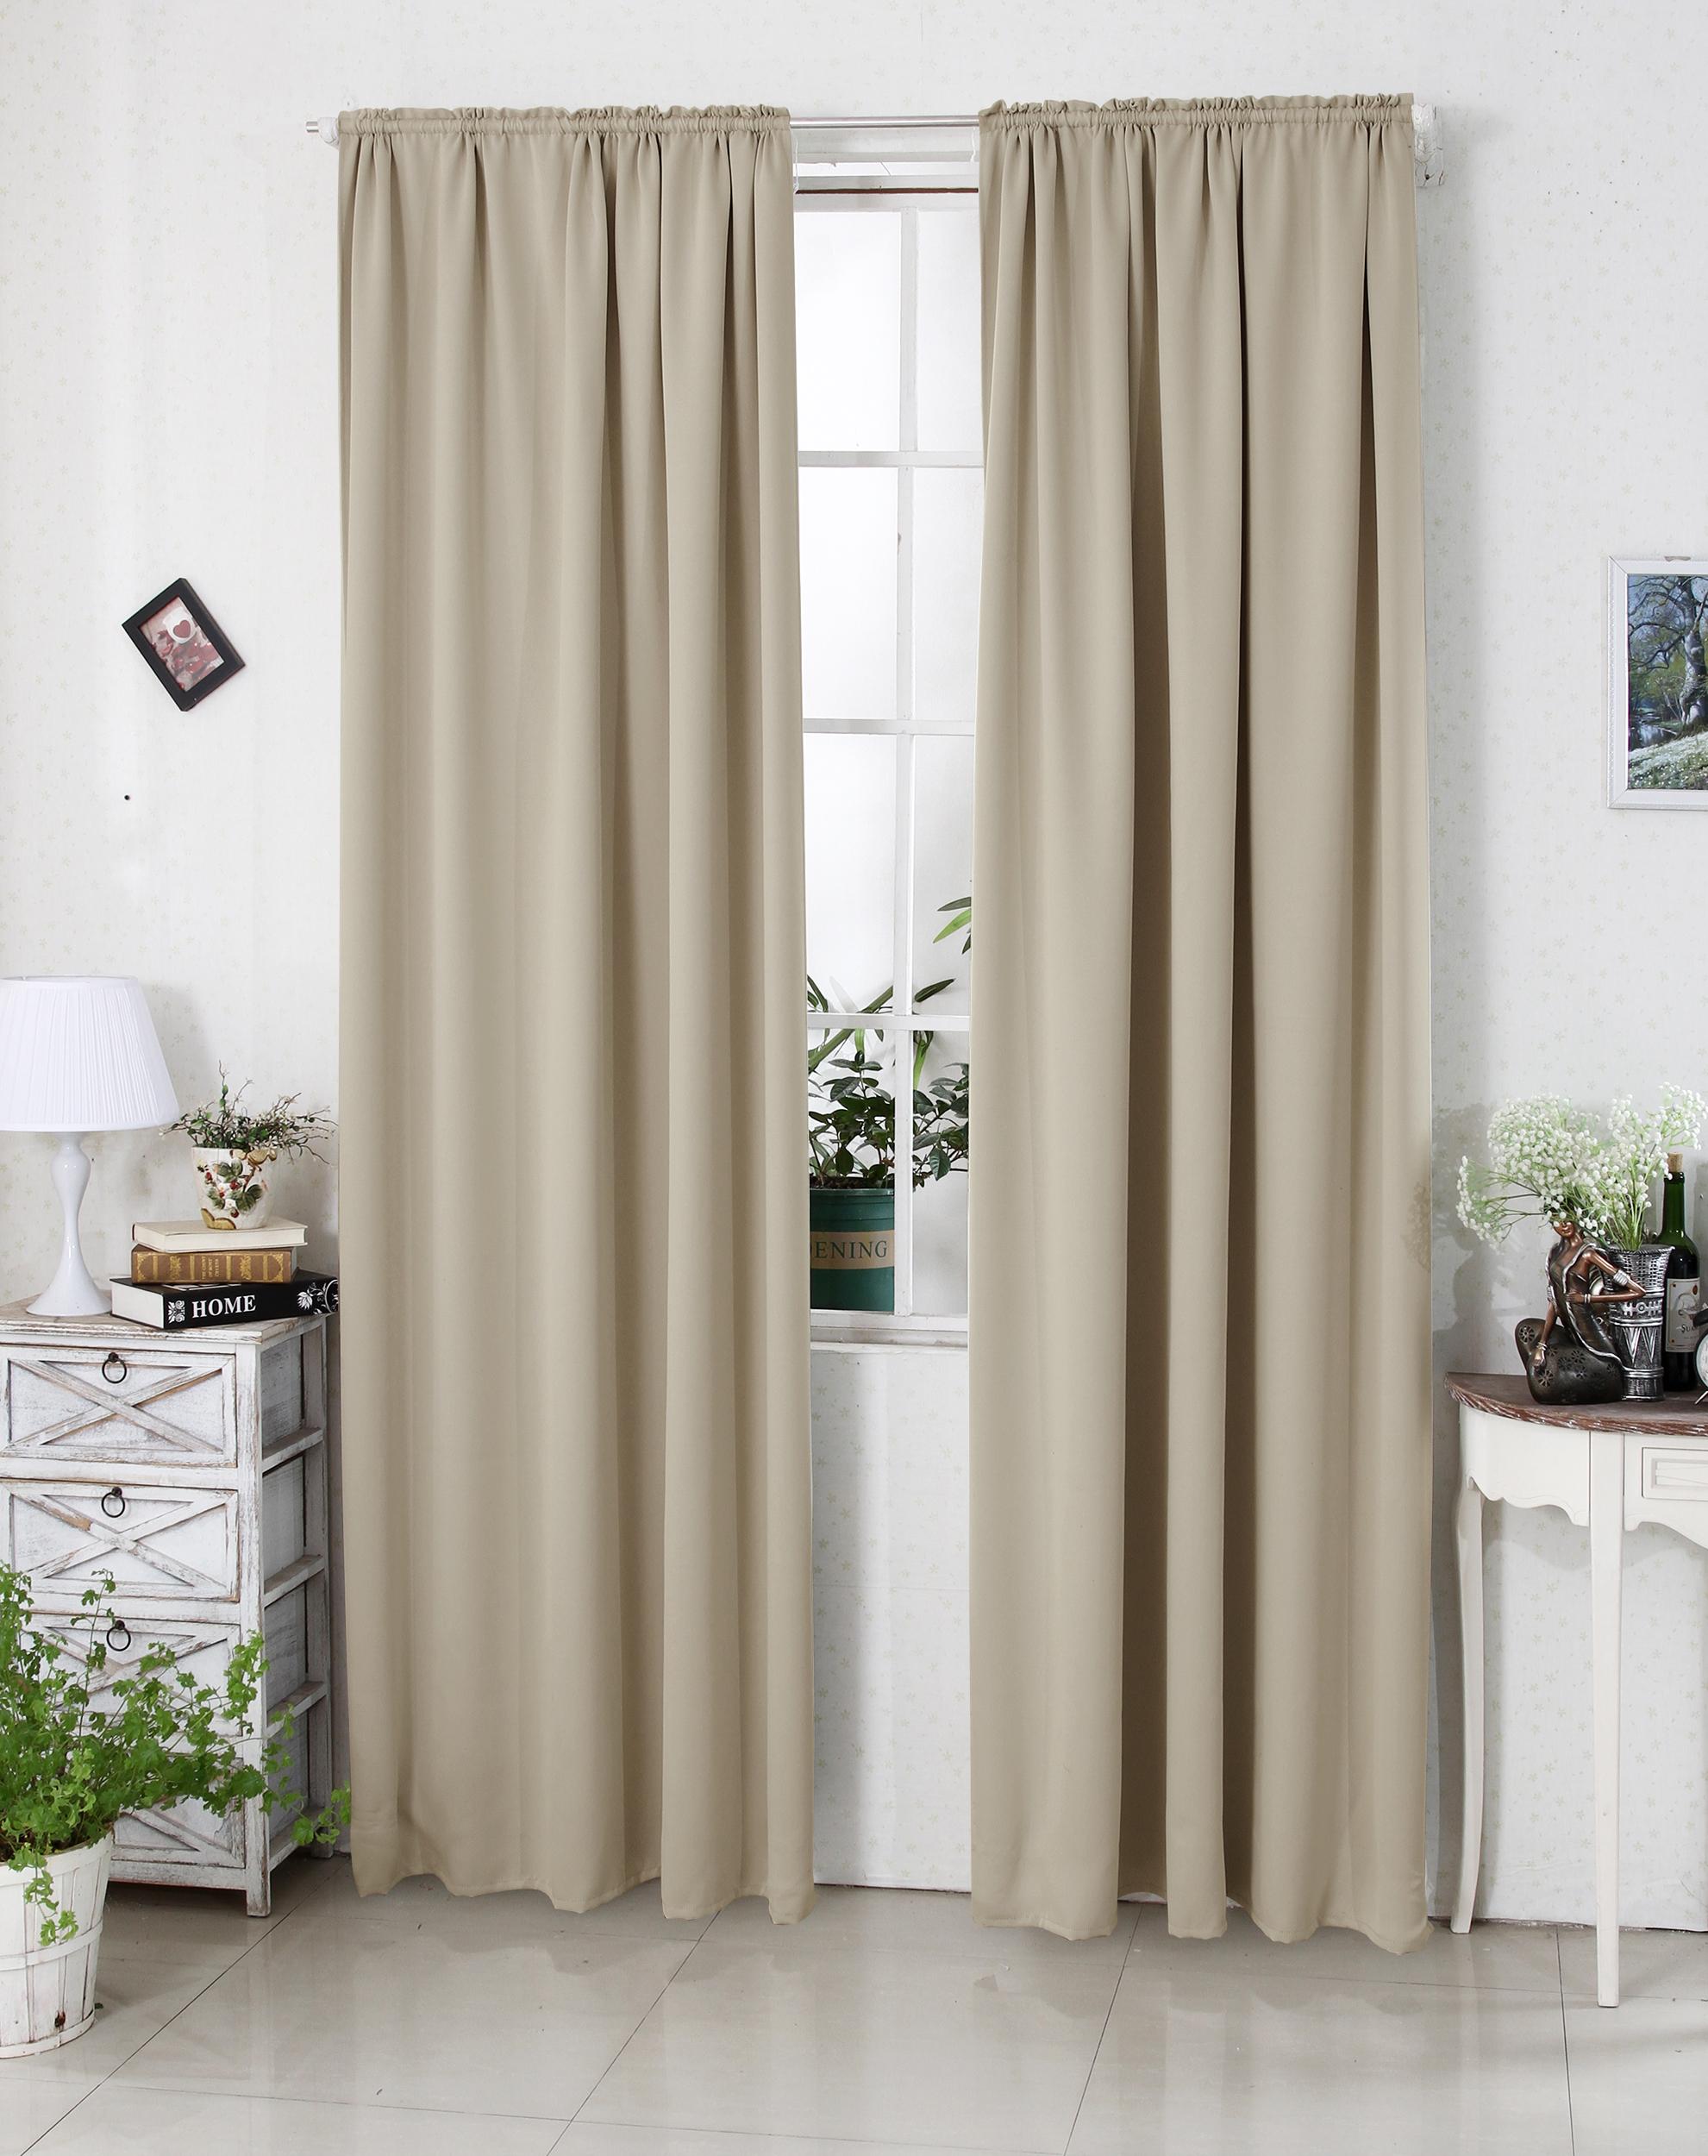 vorhang blickdicht mit kr uselband gardine thermo verdunkelung 250g m2 330 a ebay. Black Bedroom Furniture Sets. Home Design Ideas